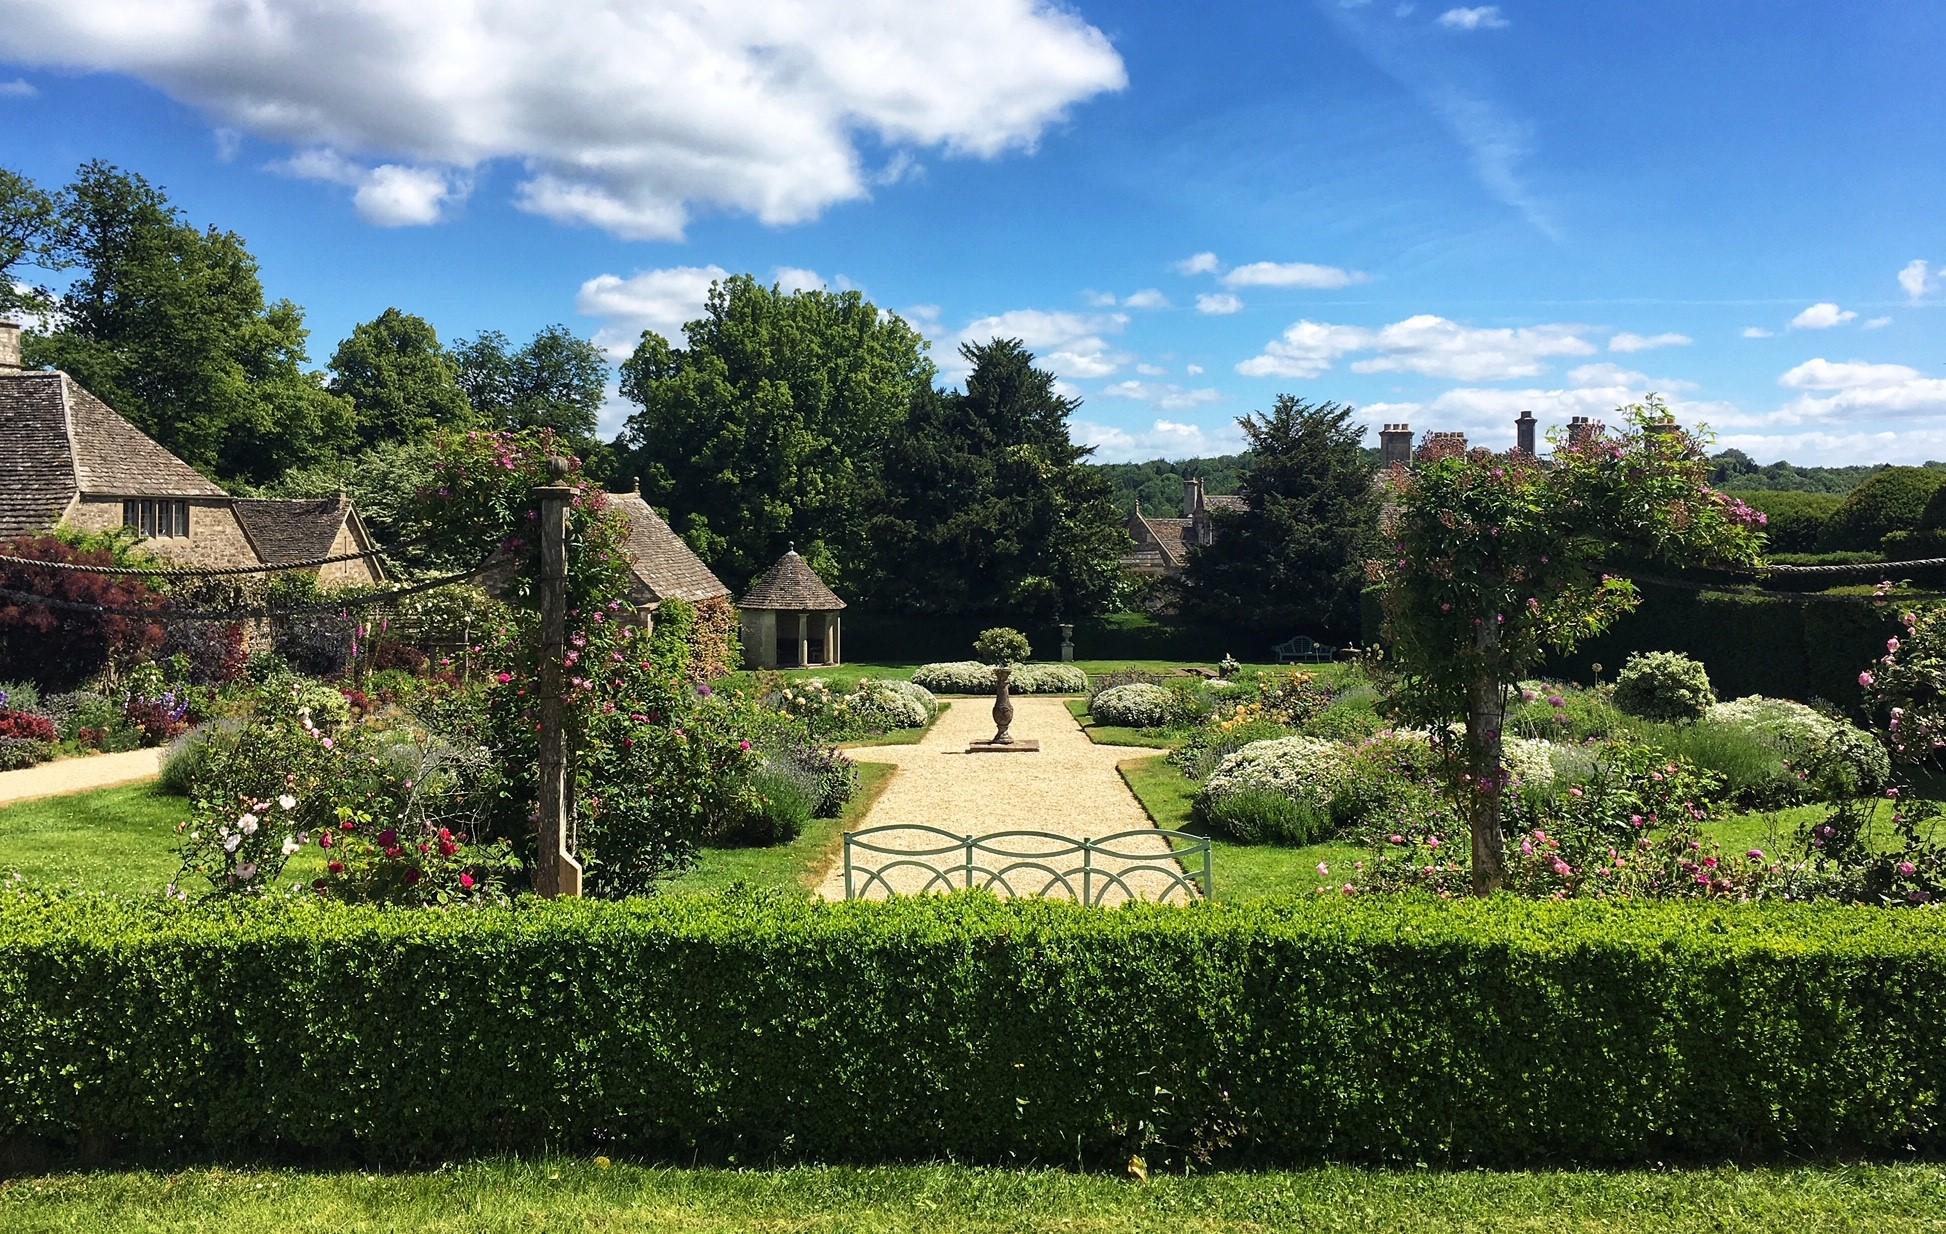 The Gardens at Miserden